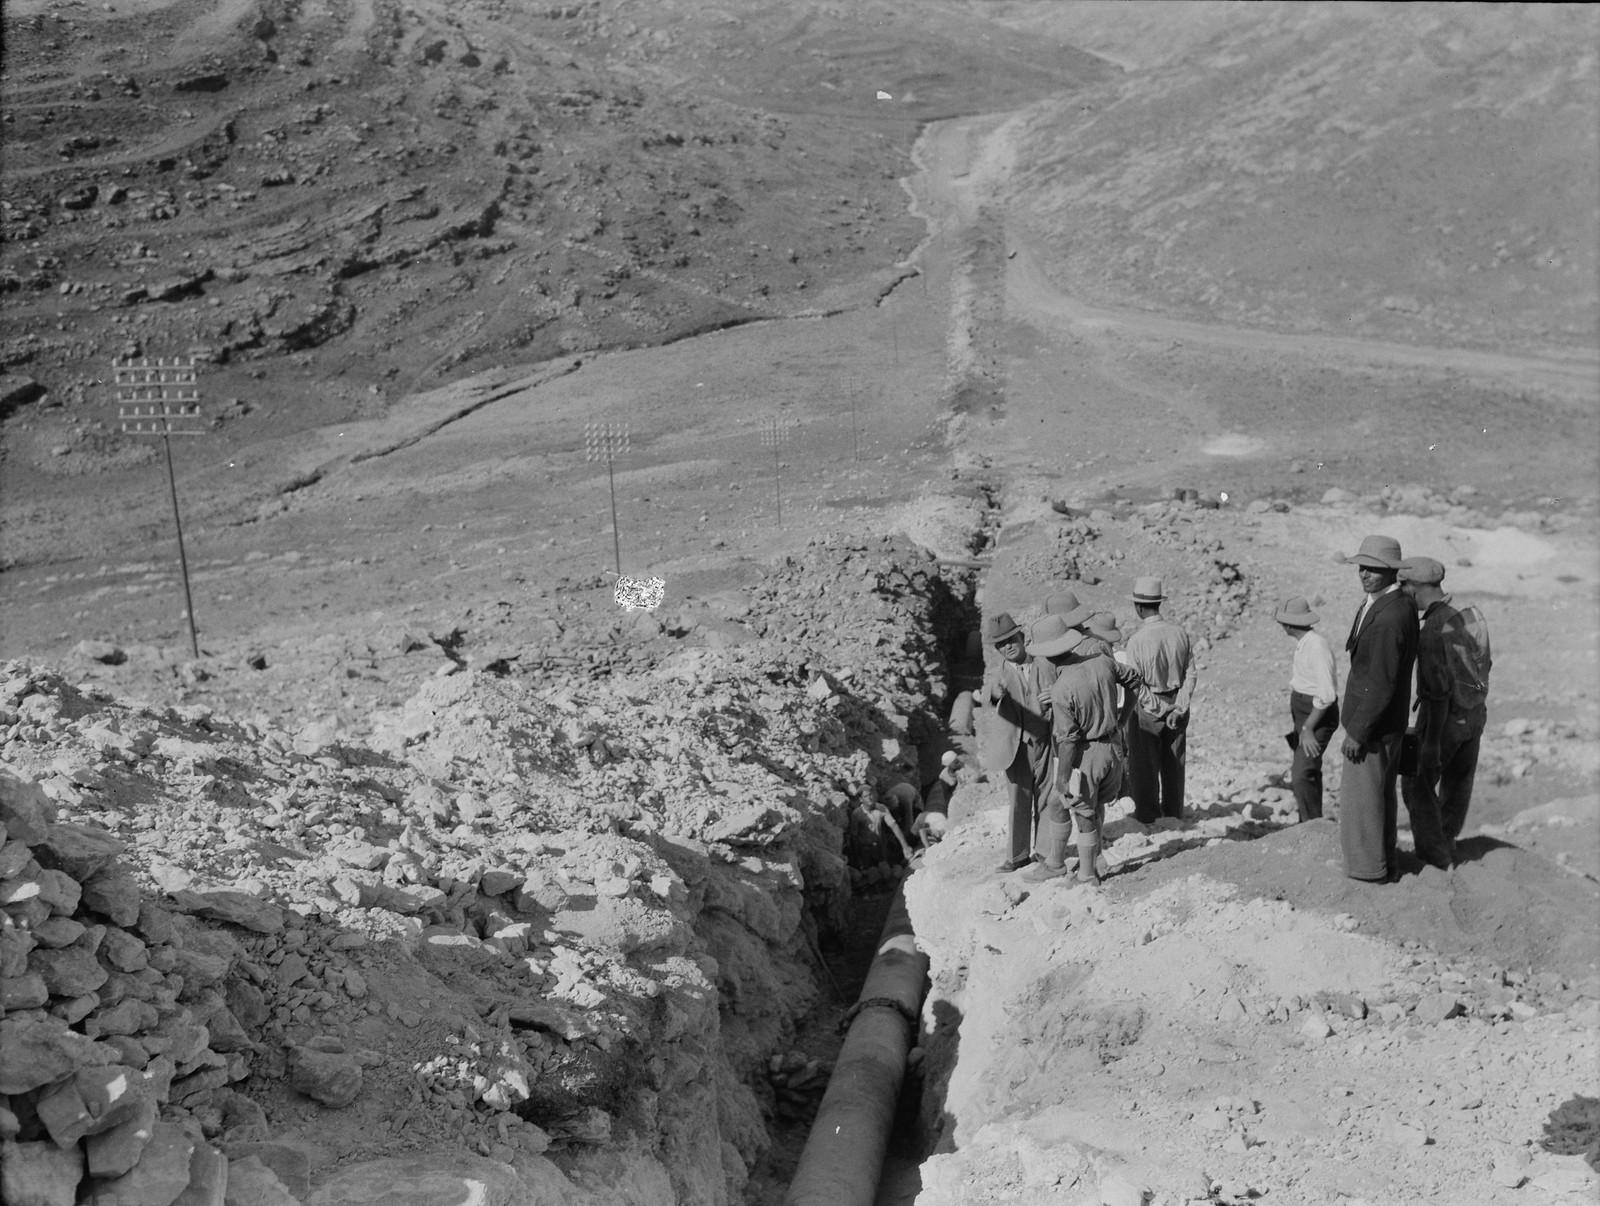 20. Трубопровод, пересекающий римскую дорогу возле Кулонии